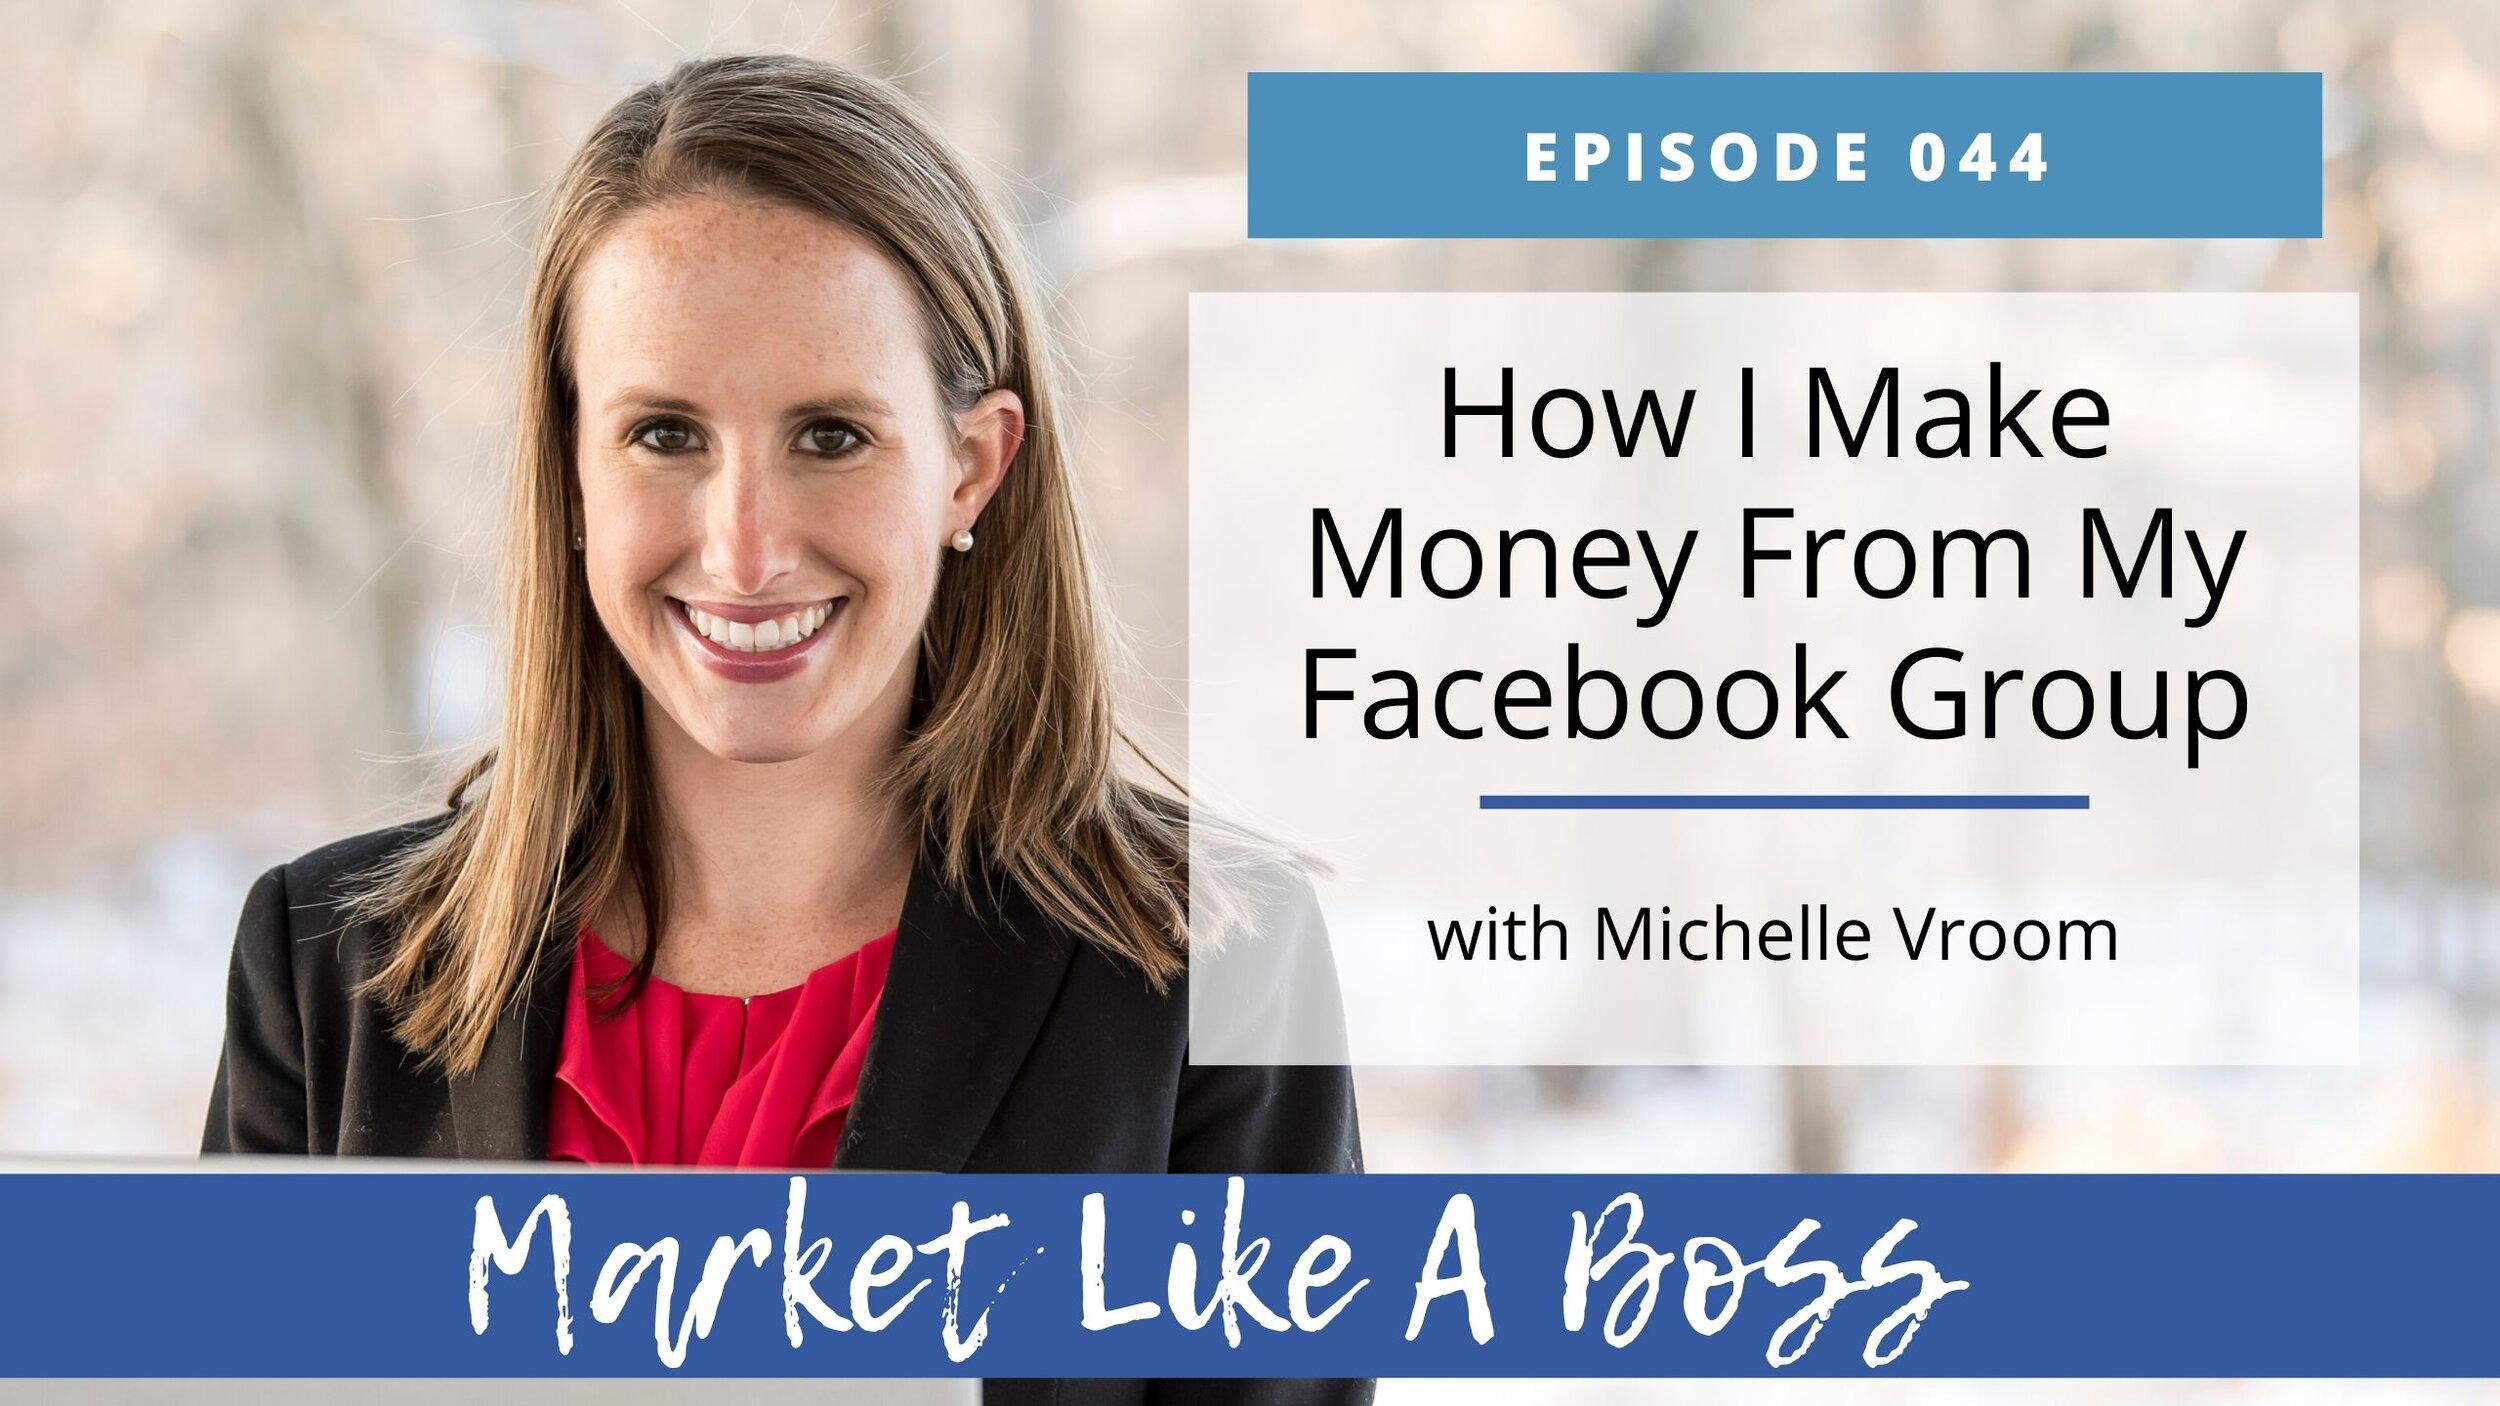 Episode 044 How I Make Money From My Facebook Group Blog.jpg